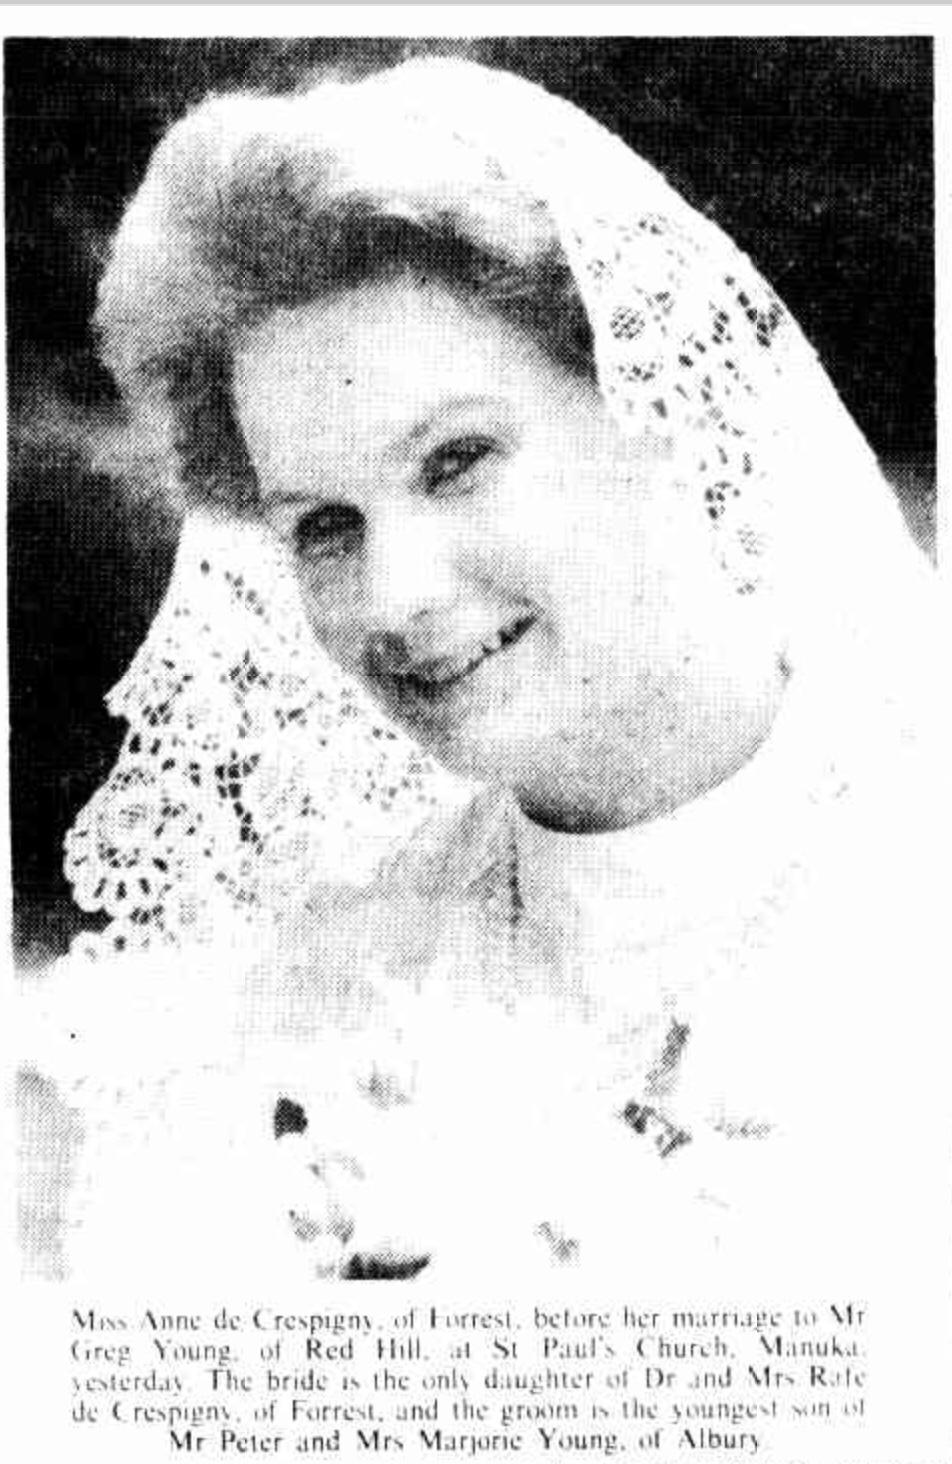 De Crespigny Anne wedding 1984